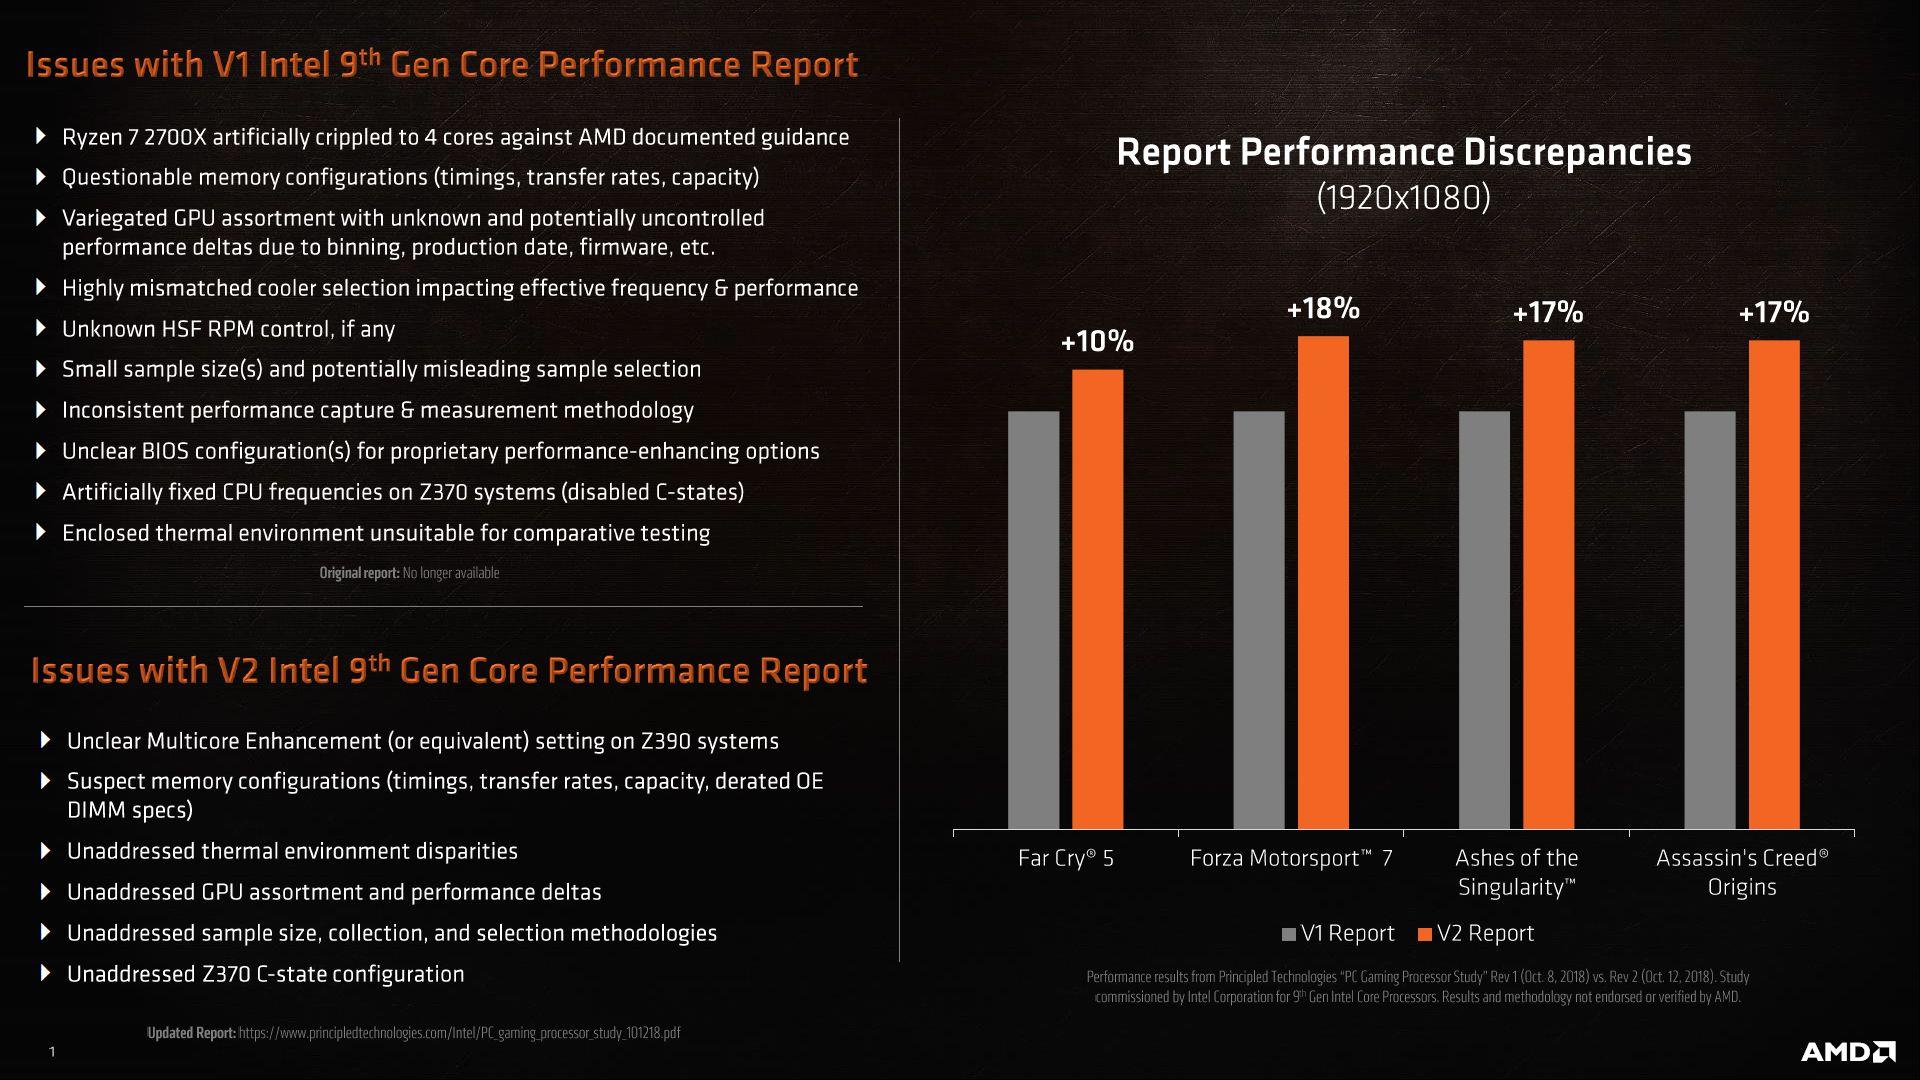 AMD procedura testowa Principled Technologies - uwagi